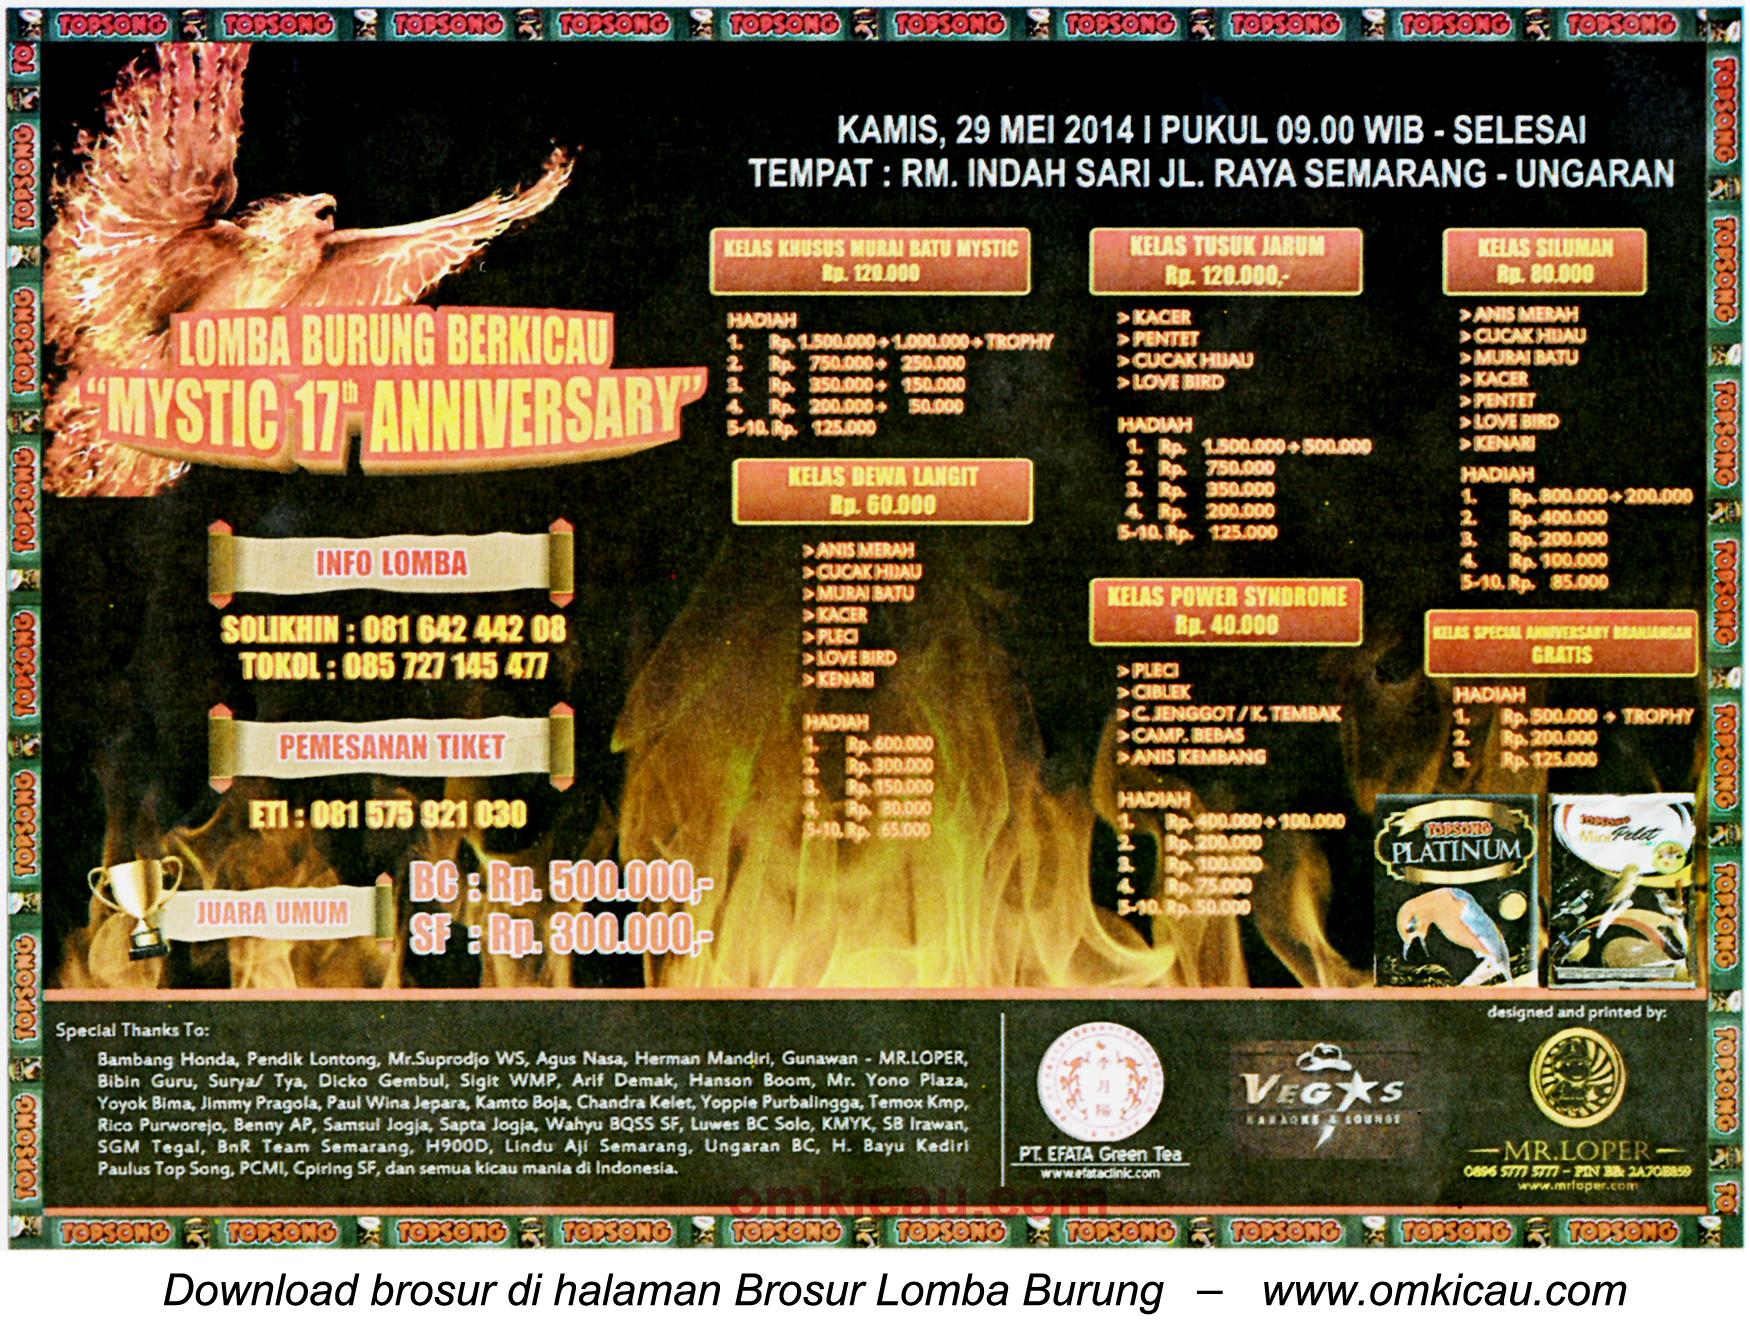 Brosur Lomba Burung Berkicau Mystiz 17th Anniversary, Ungaran, 29 Mei 2014